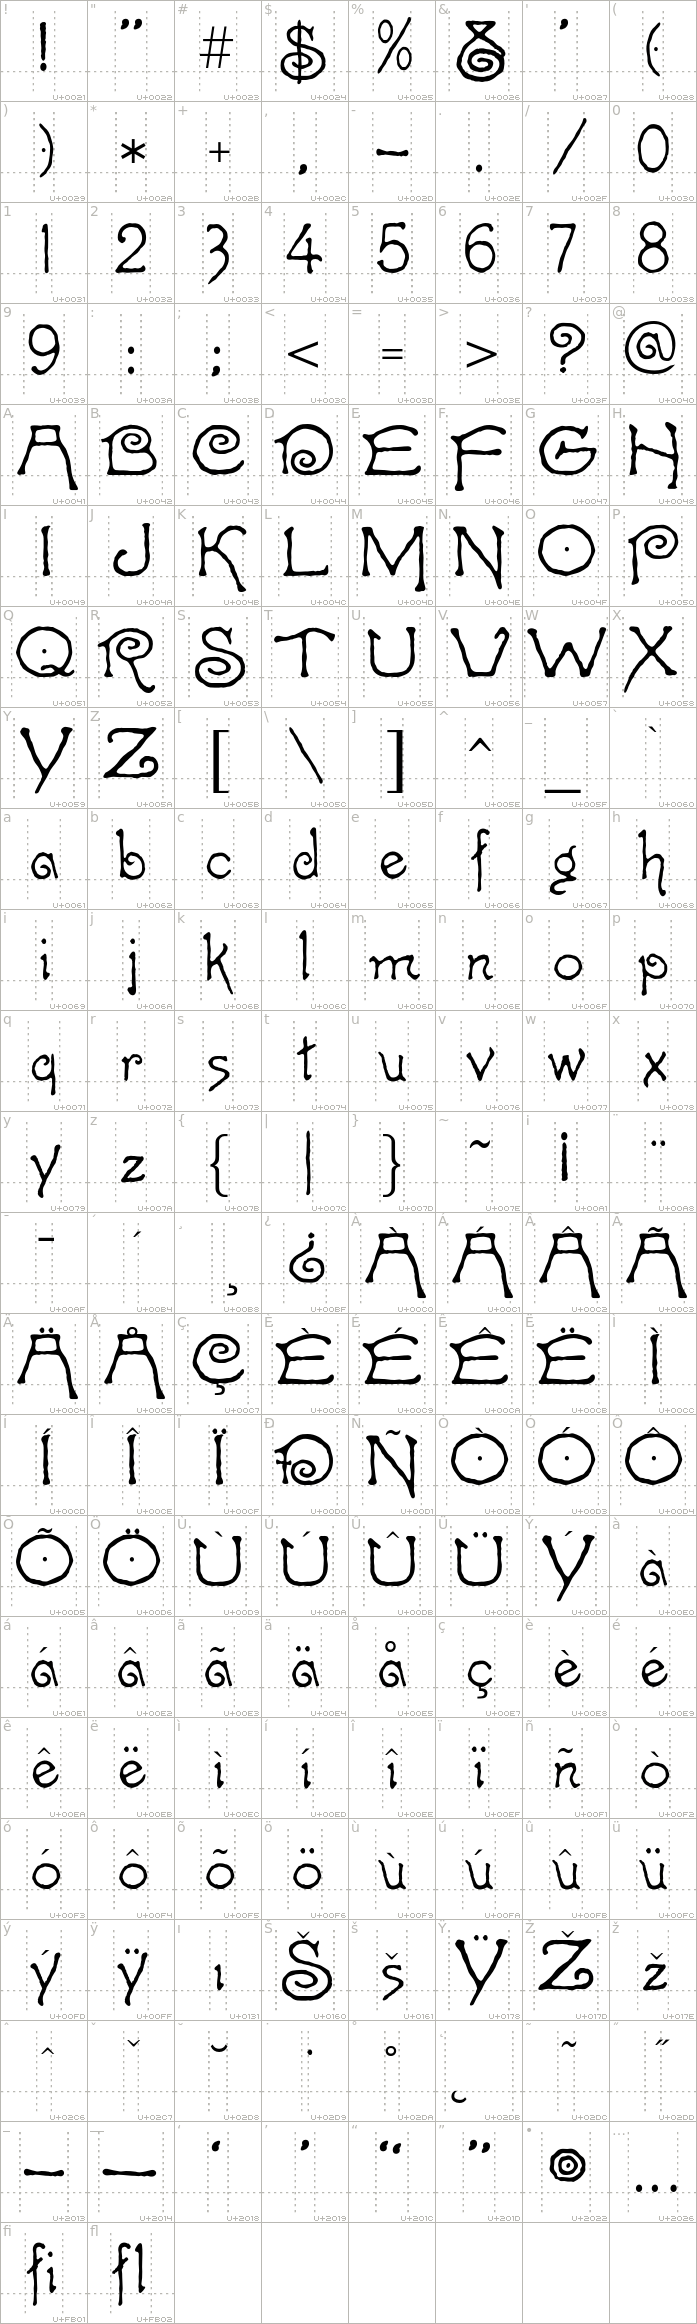 caprice.medium.character-map-1